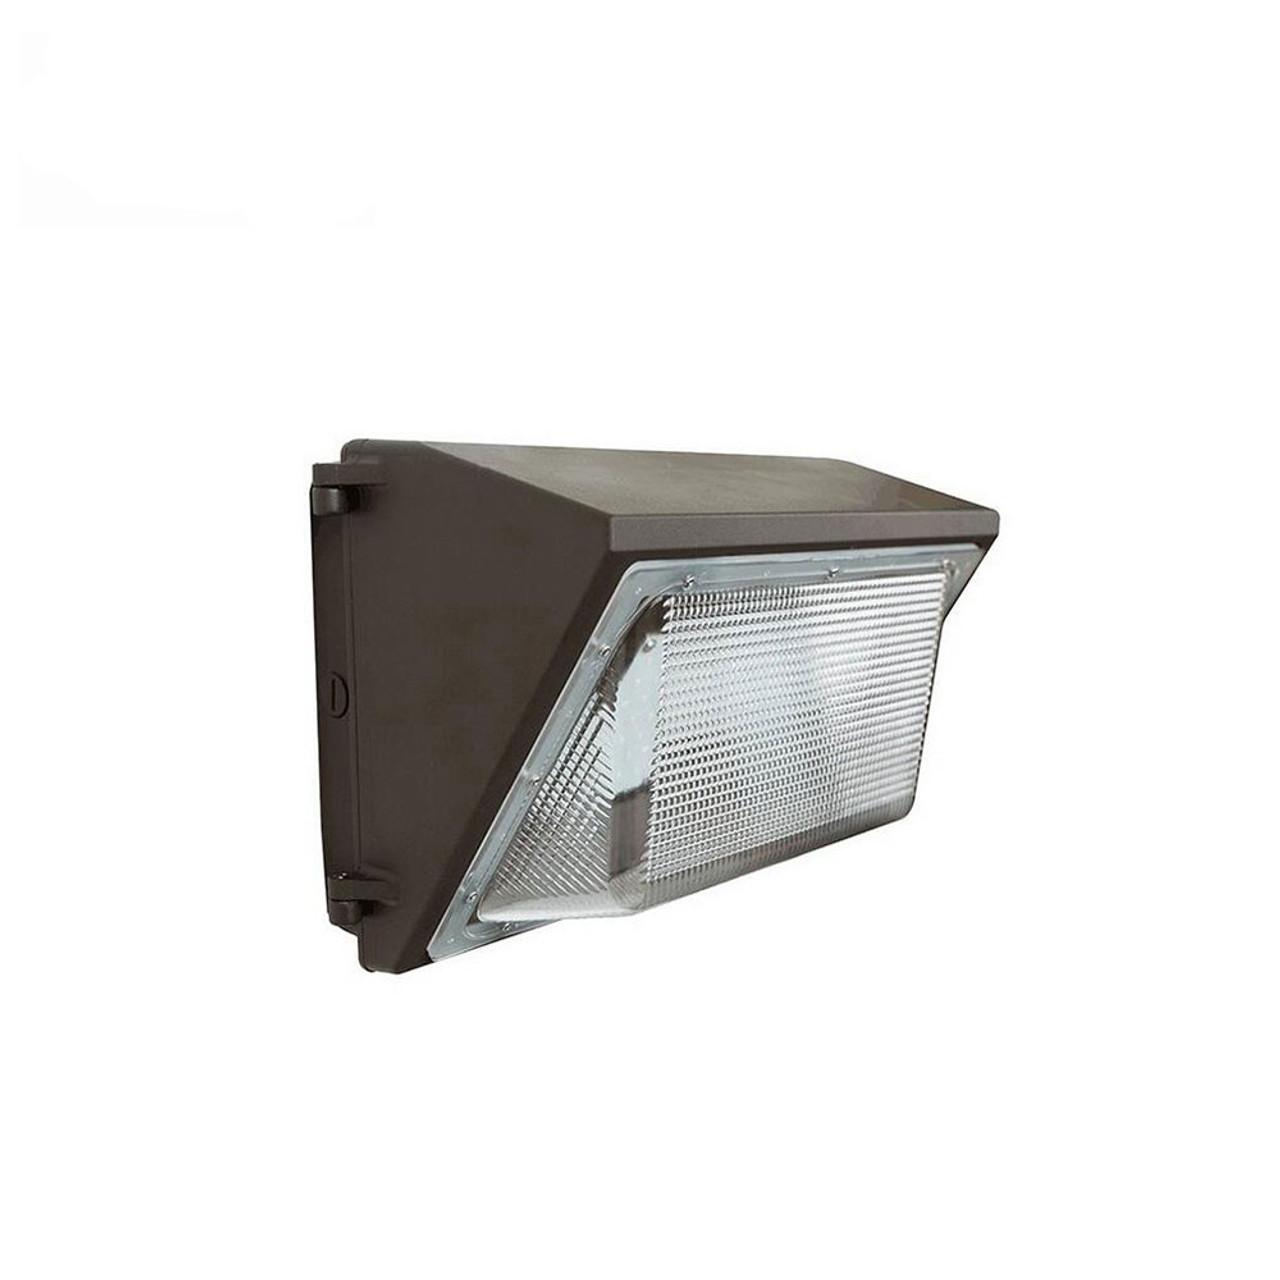 LED Wall Pack, 40 Watt, 4800 lumen, 5000 Kelvin, 100-277 volt, UL and DLC Listed